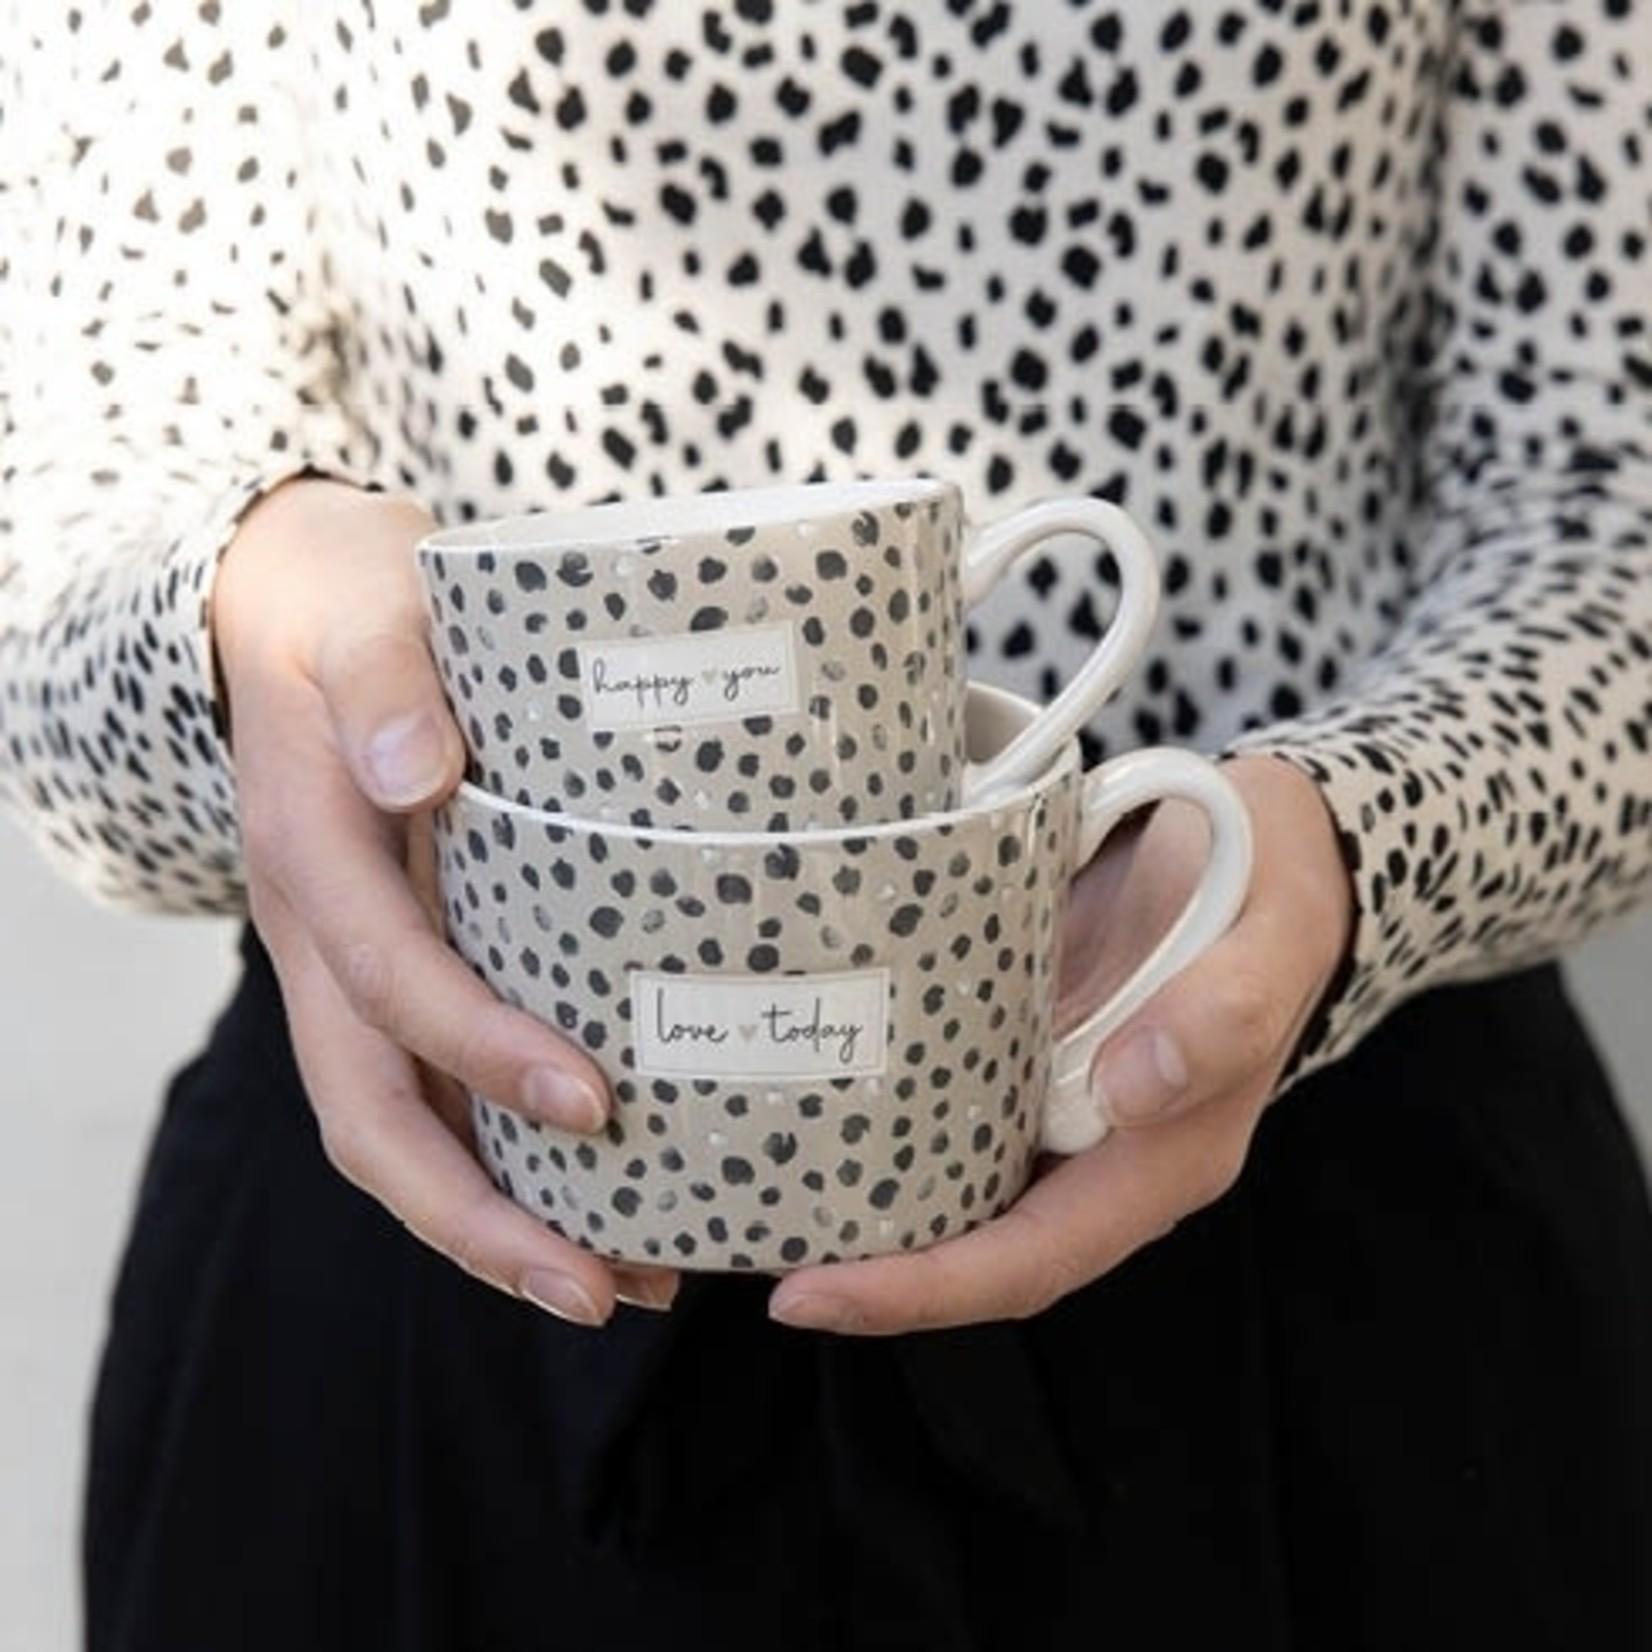 Bastion Collections Cup Confetti Love Today Titane/black 10x8x7 cm